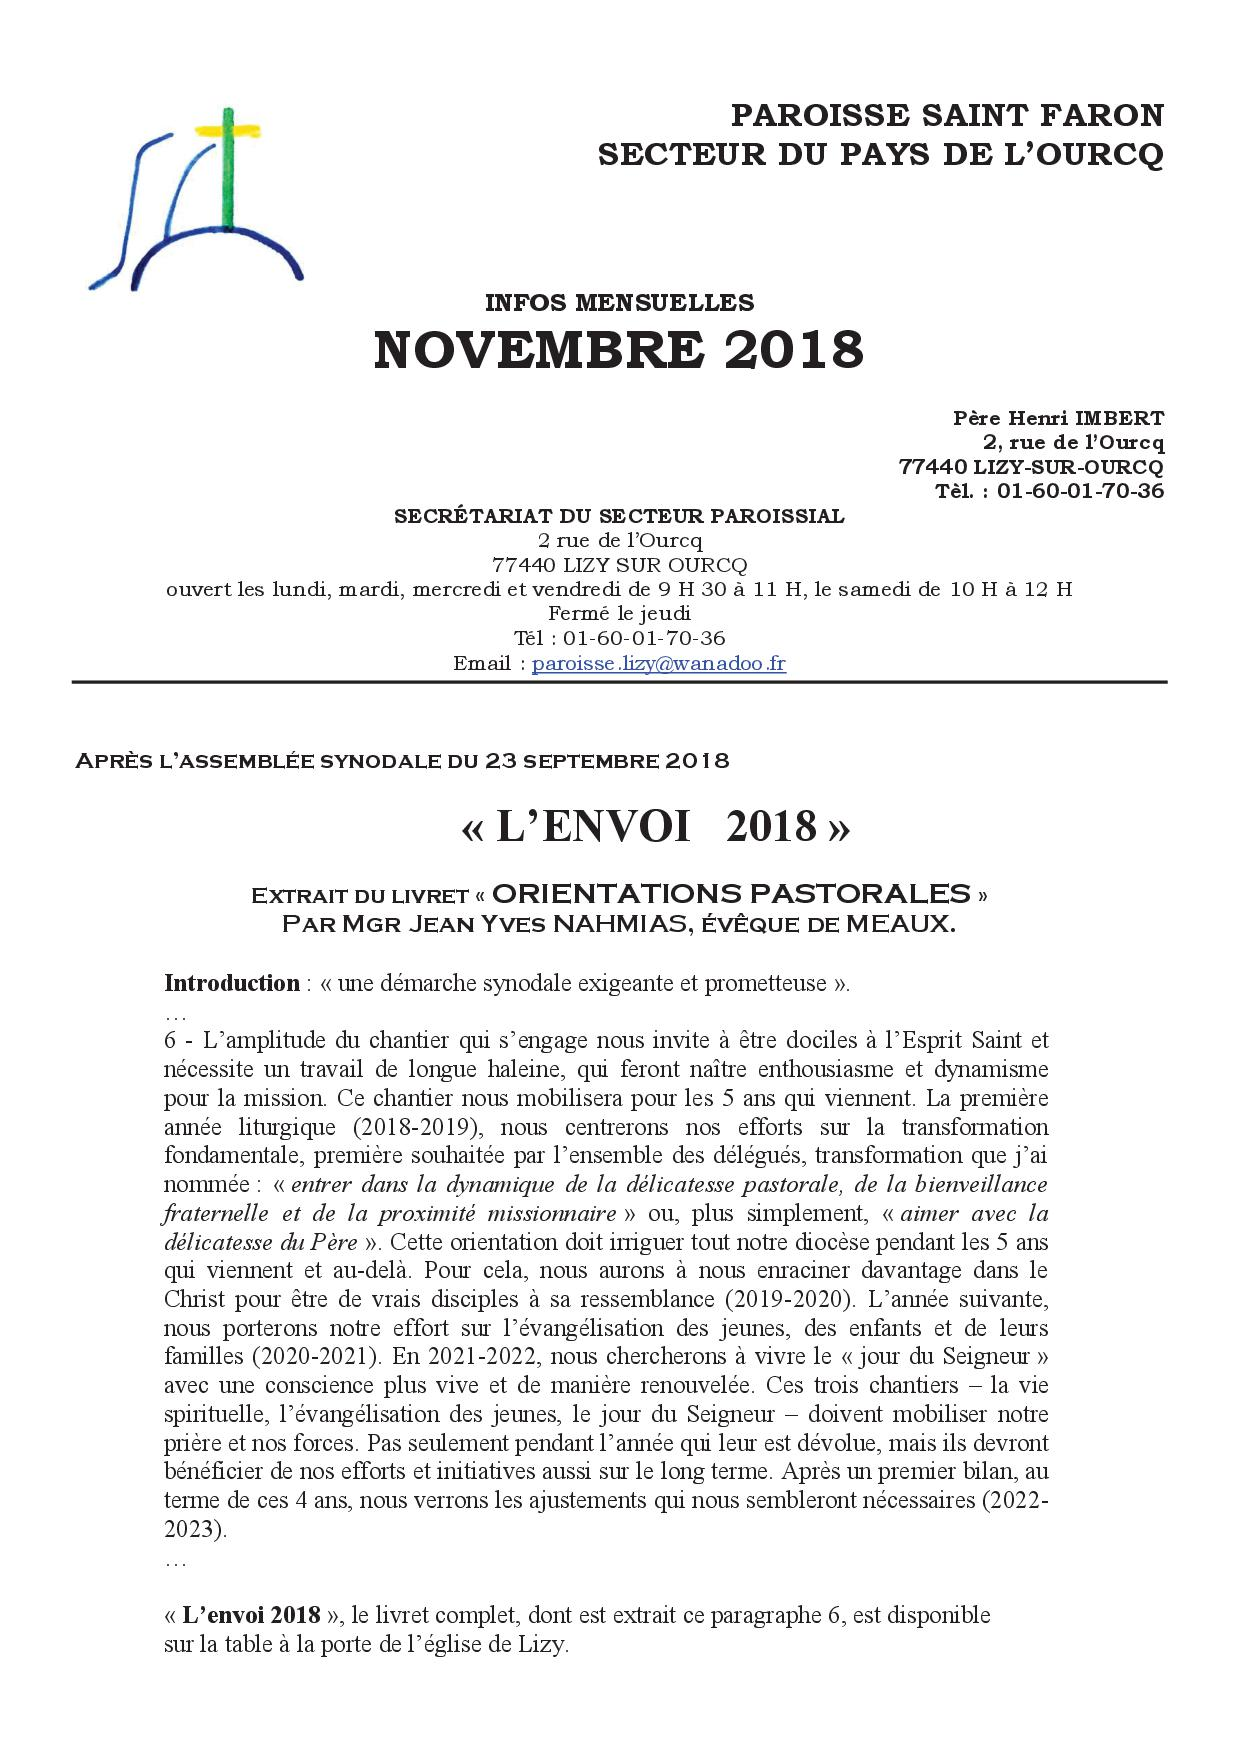 LsO feuille 11 novembre 2018_1